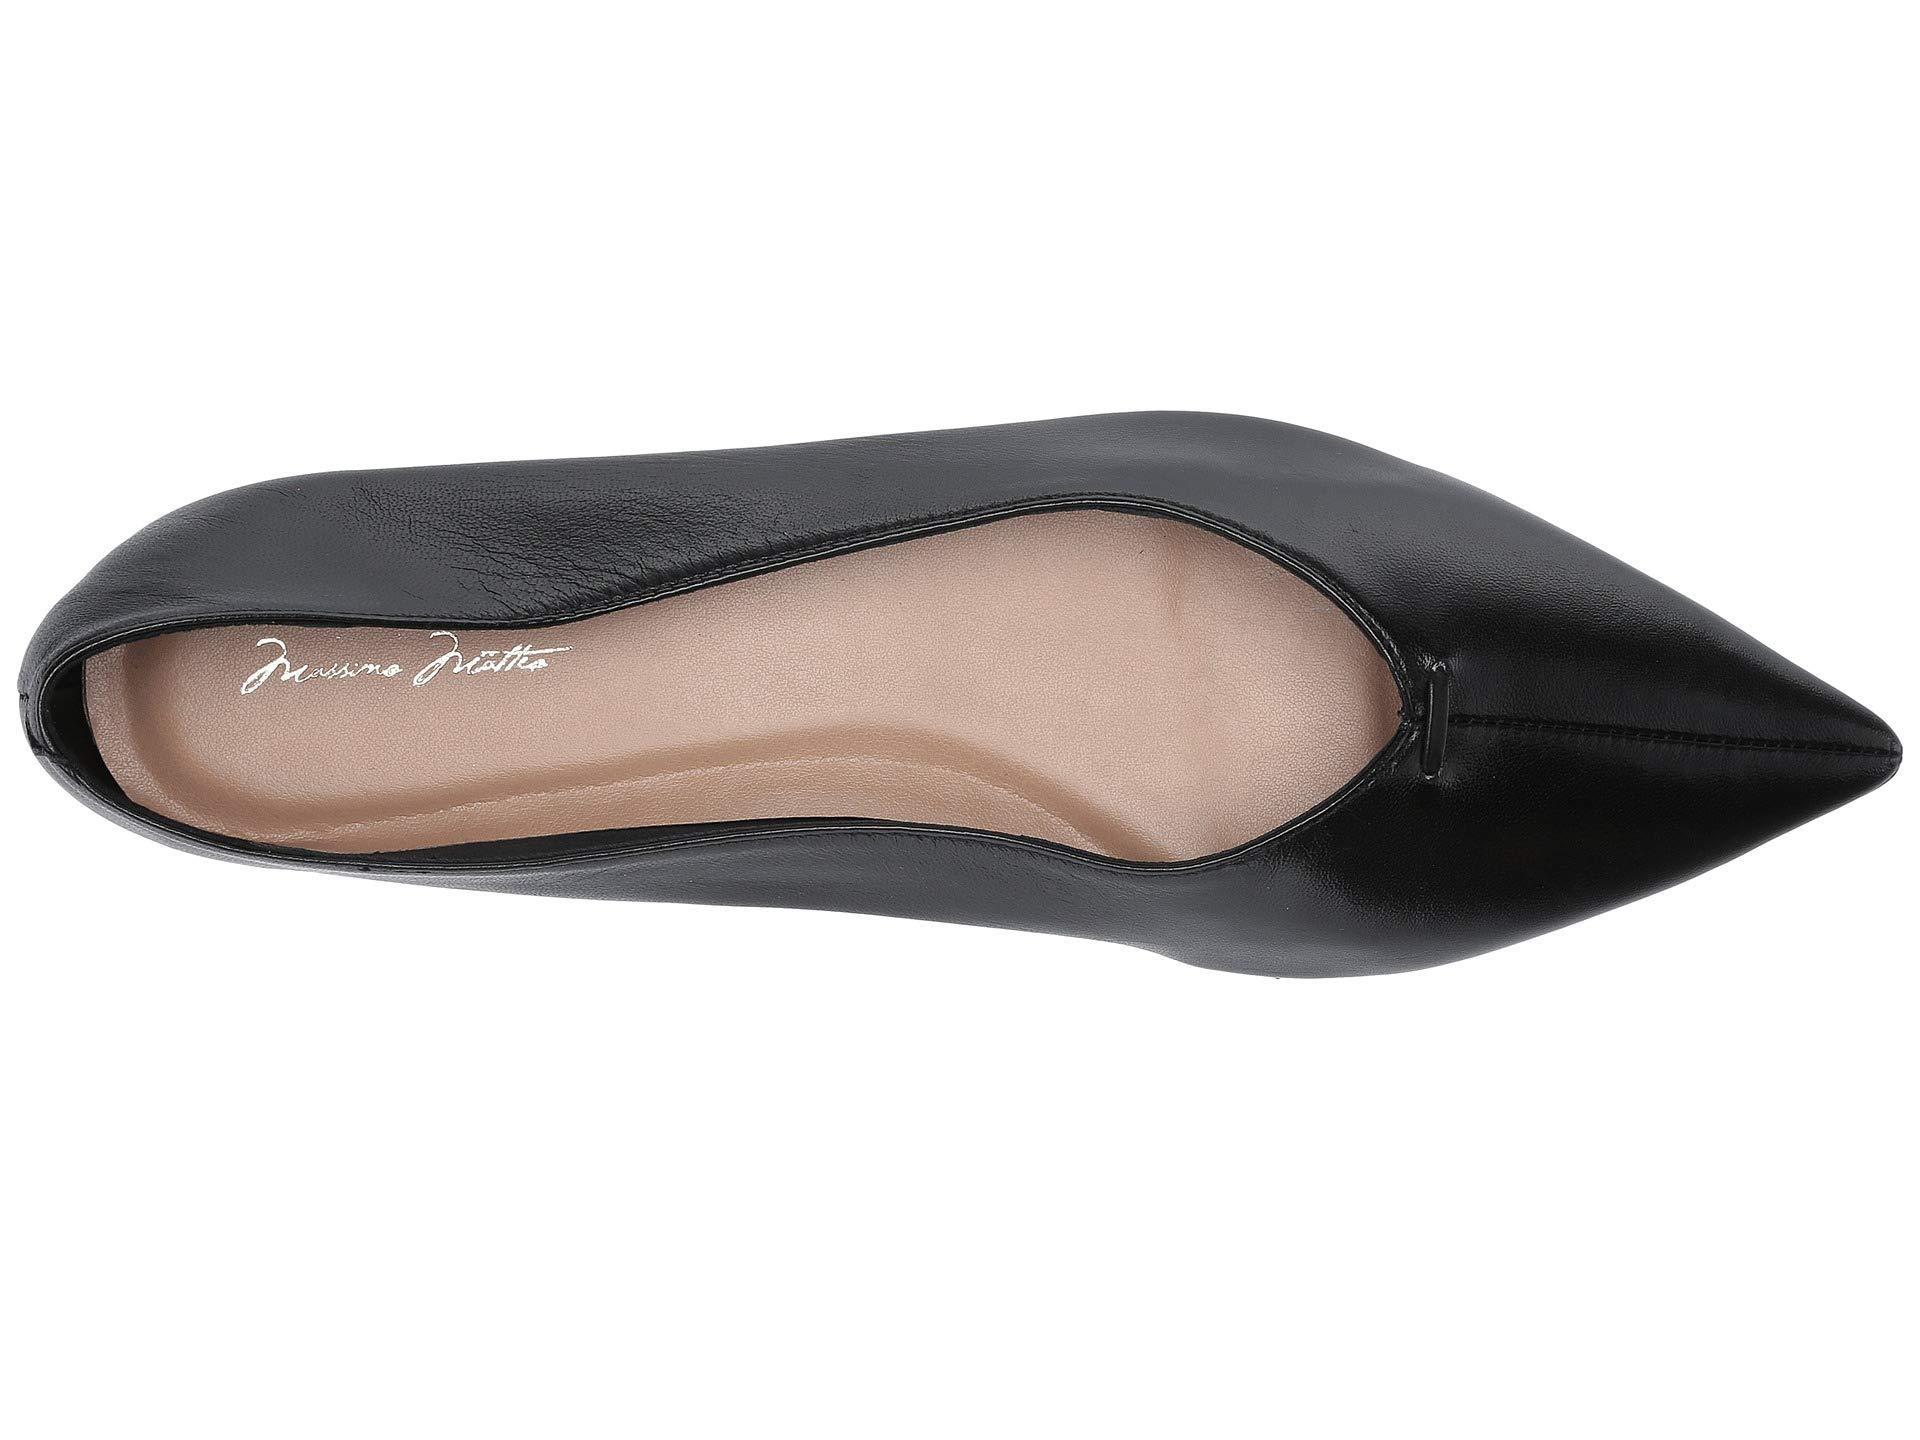 a7cc877f6 Lyst - Massimo Matteo Raquel Flat (linen Leather) Women's Flat Shoes ...